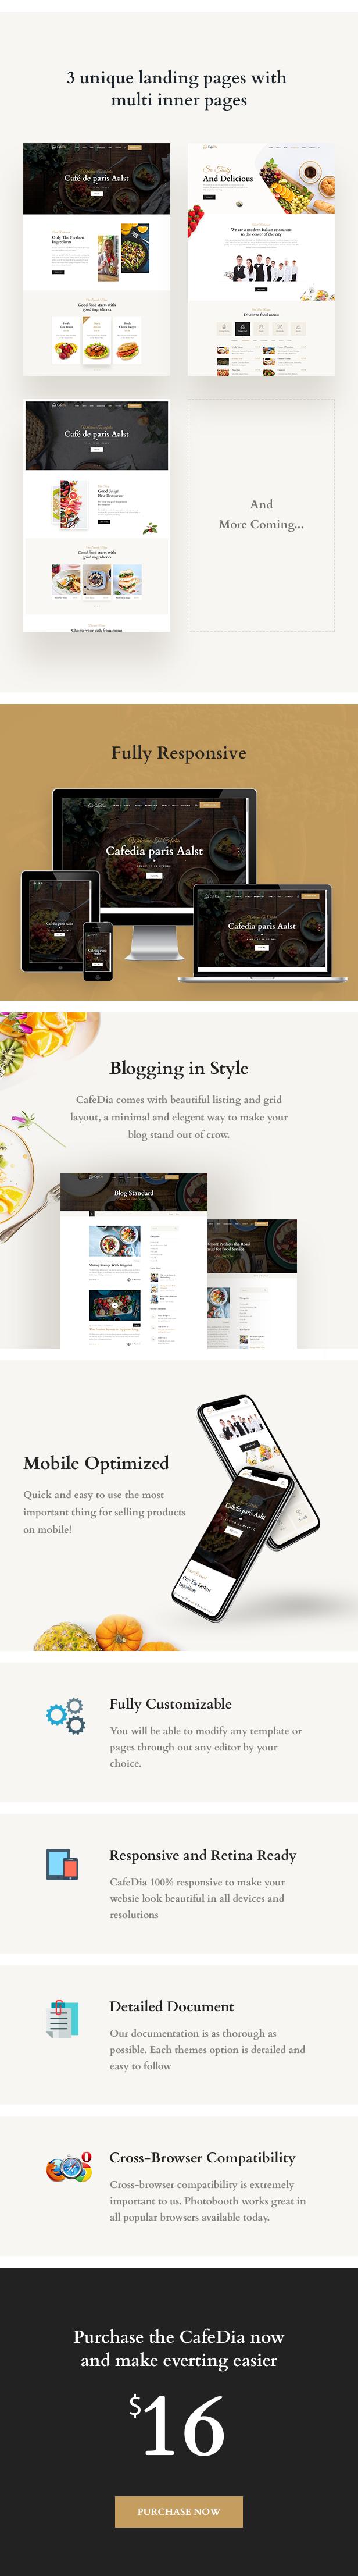 CafeDia- Restaurant HTML5 Template - 2